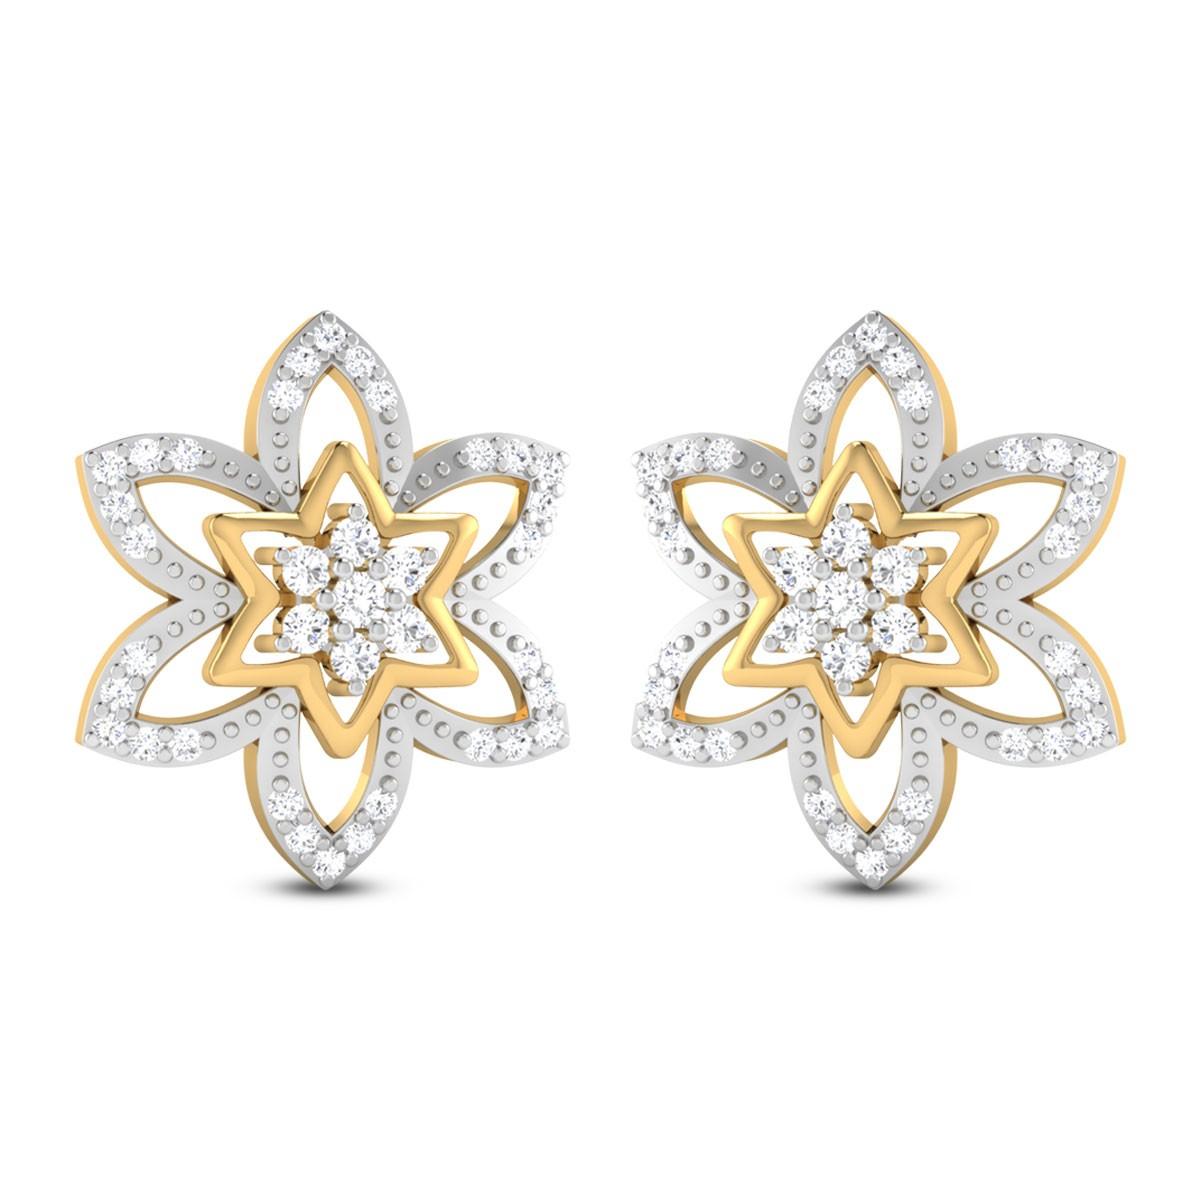 Elian Floral Diamond Stud Earrings